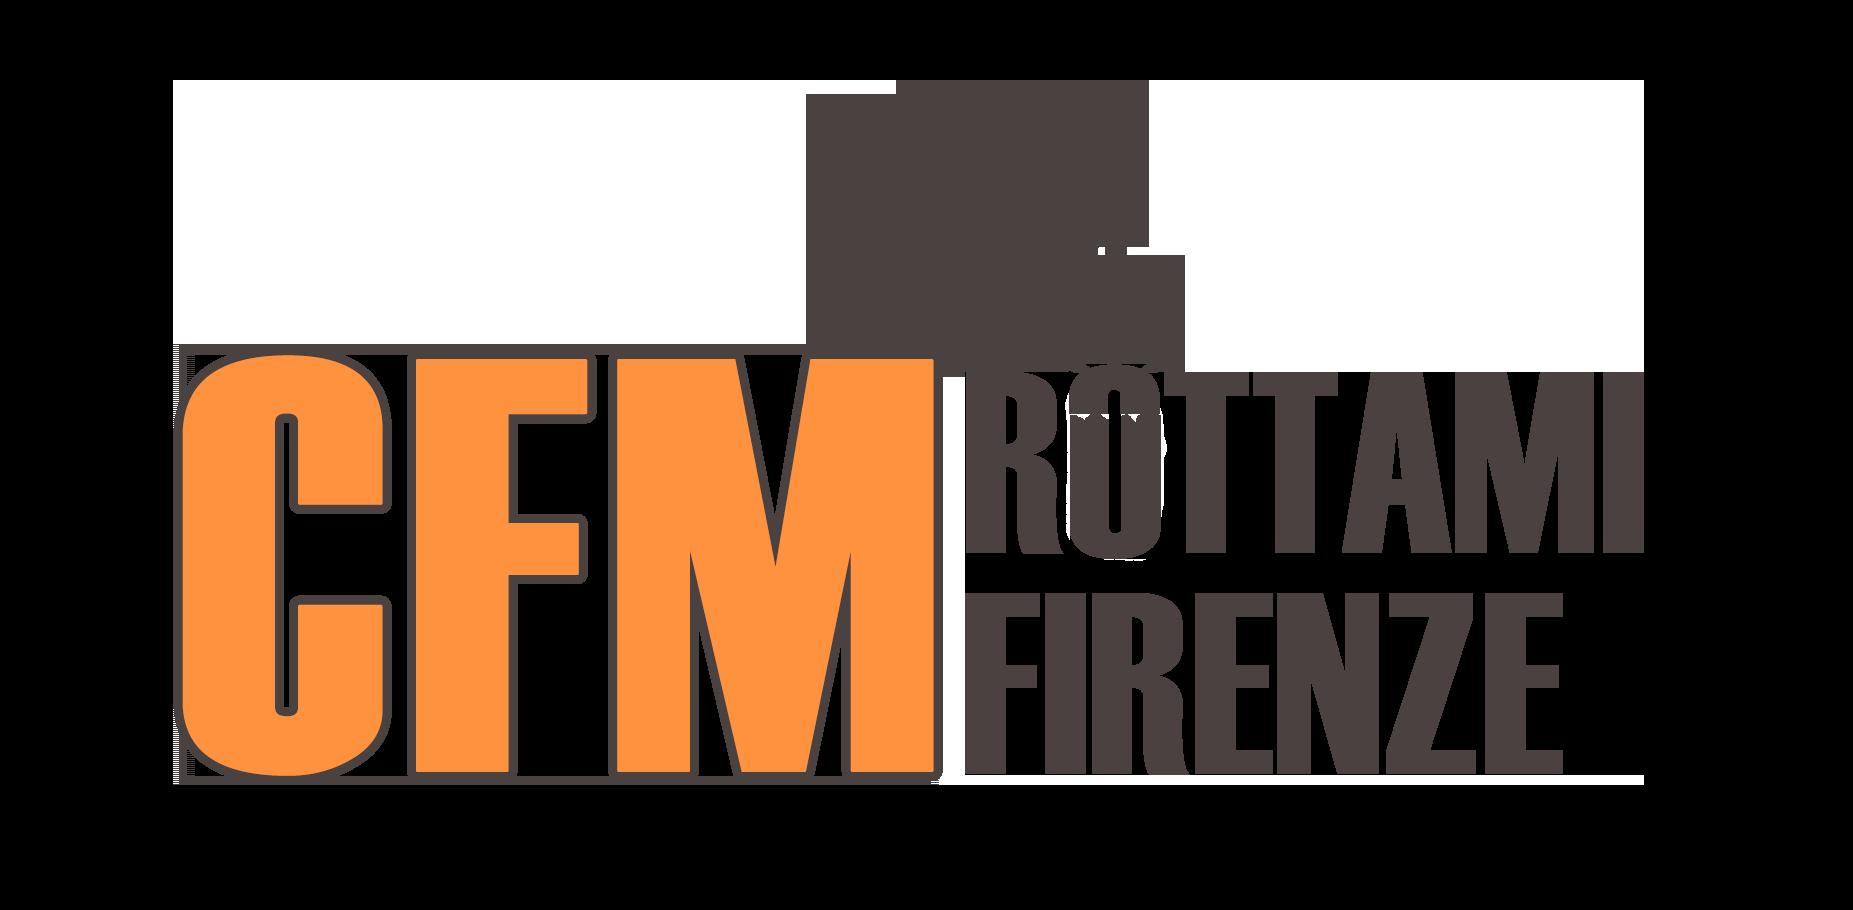 CFM Rottami Firenze